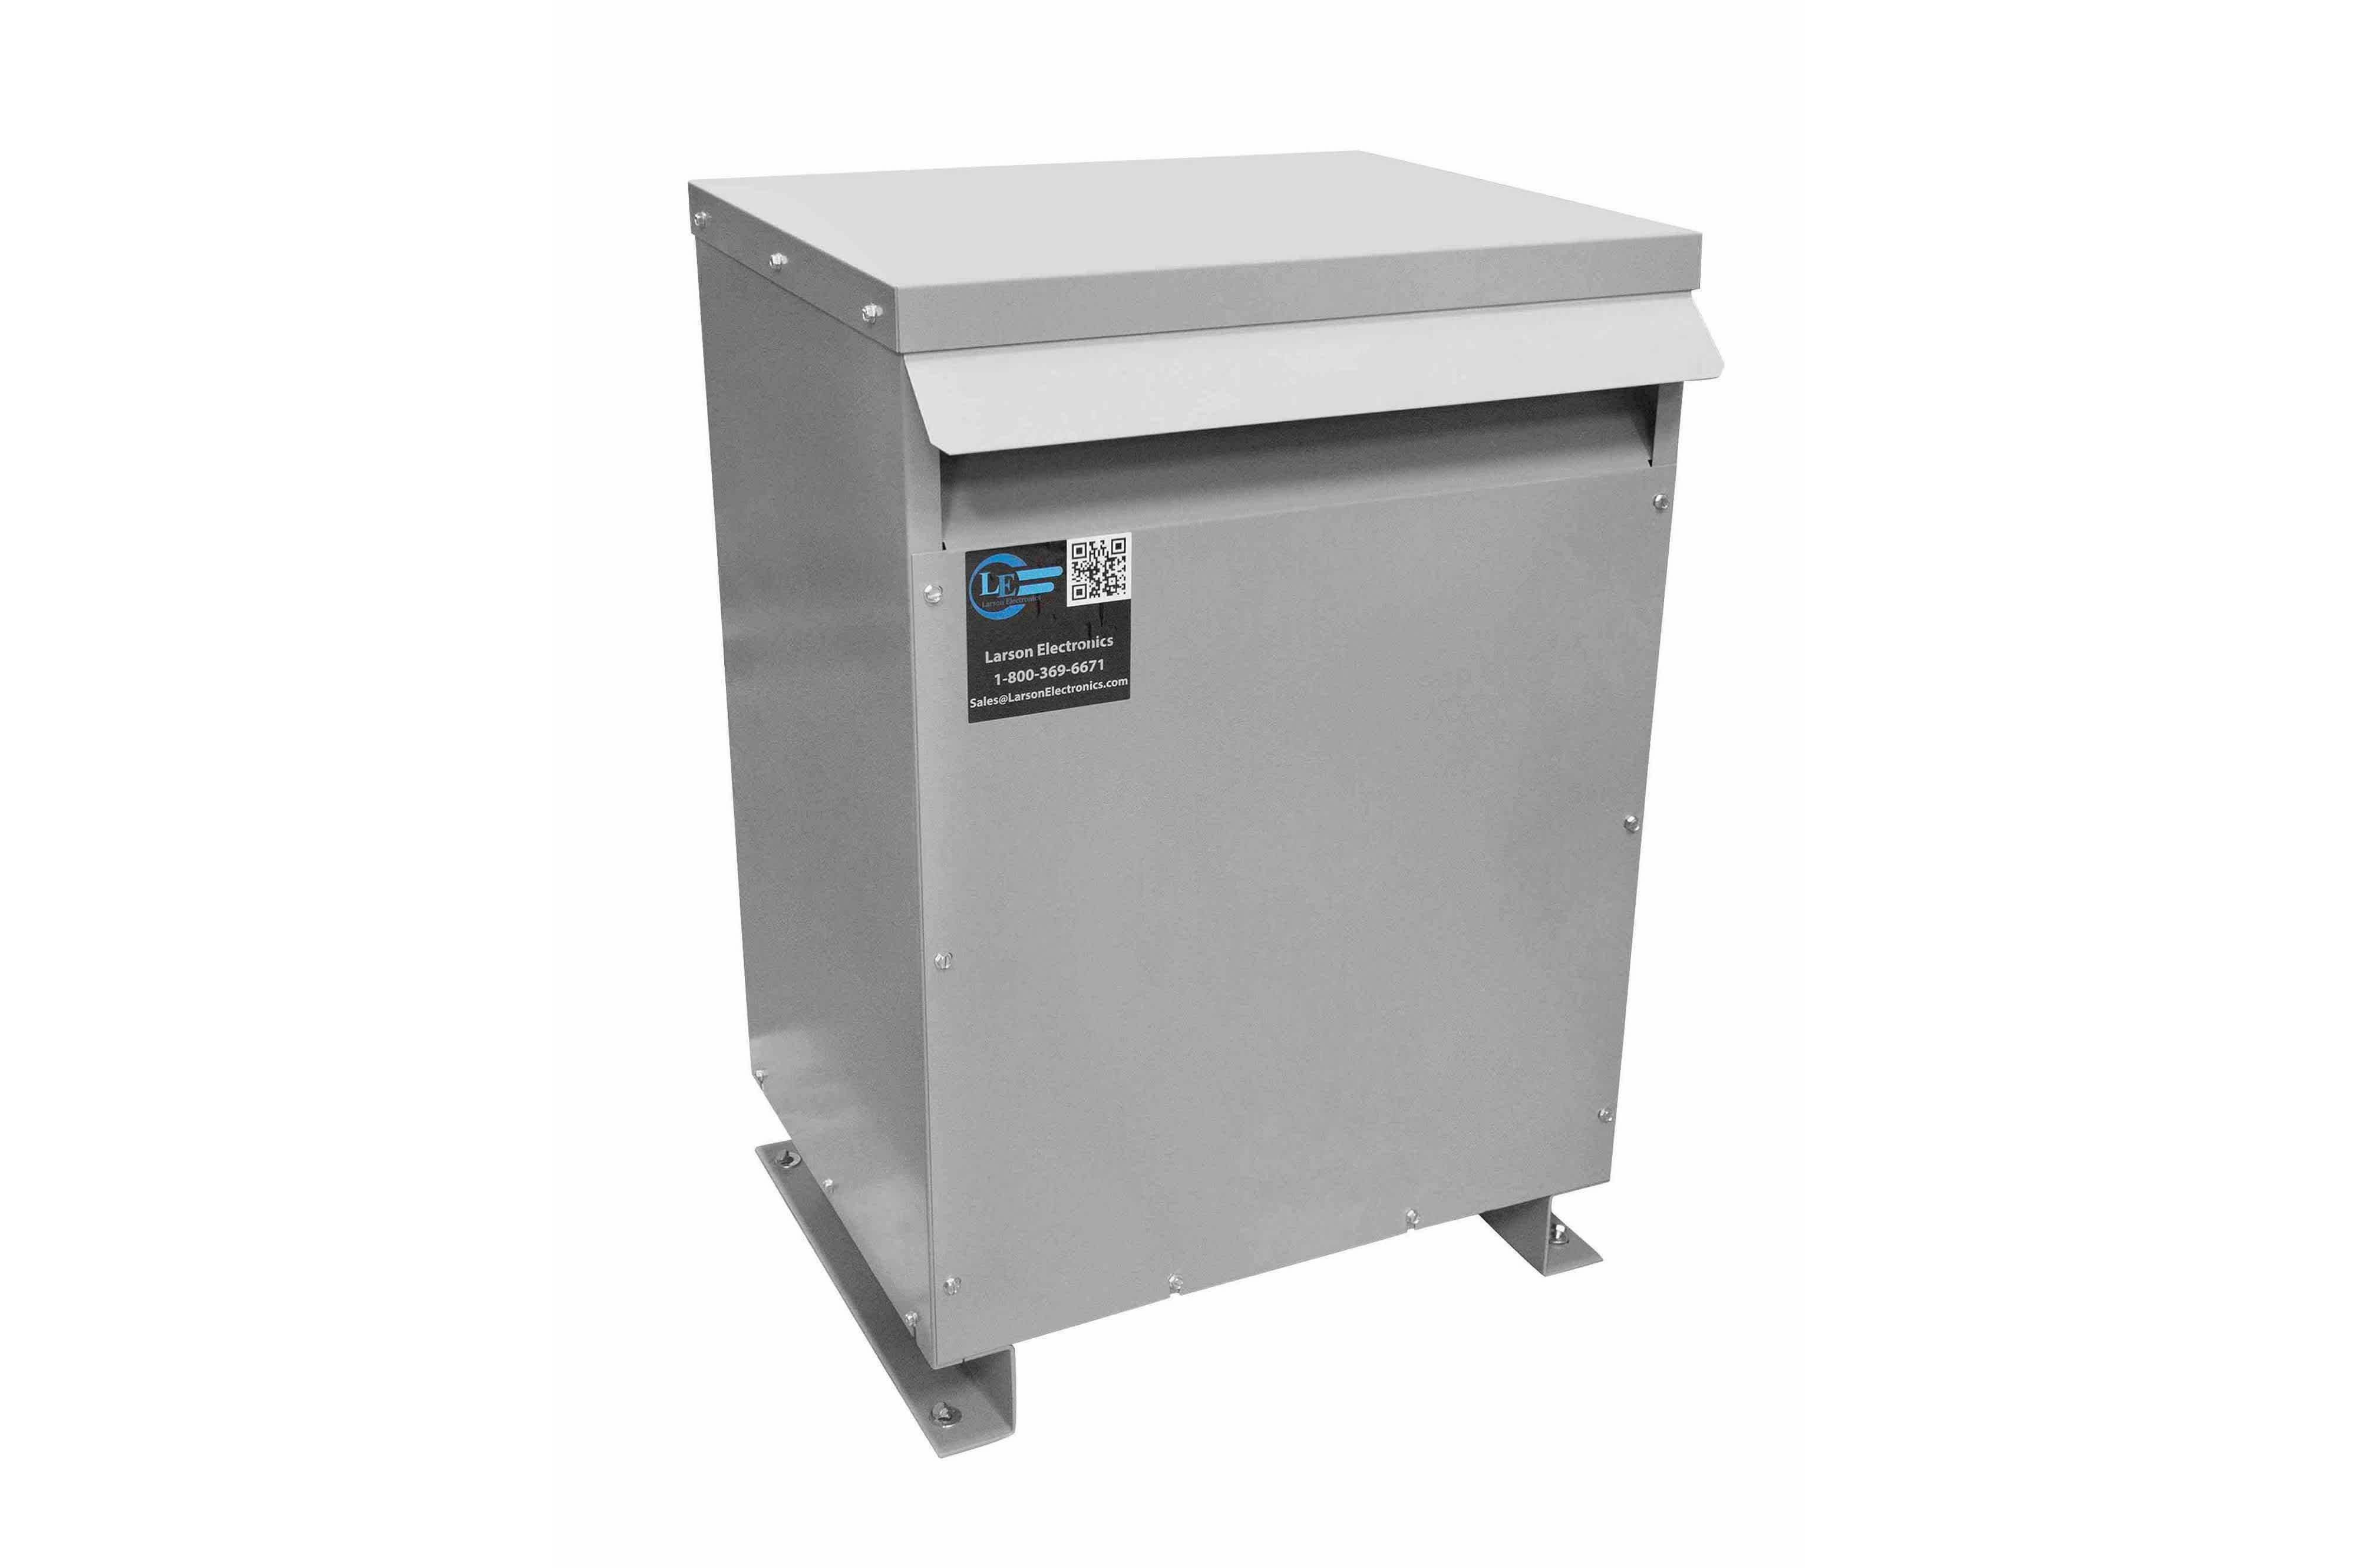 110 kVA 3PH Isolation Transformer, 600V Wye Primary, 460Y/266 Wye-N Secondary, N3R, Ventilated, 60 Hz